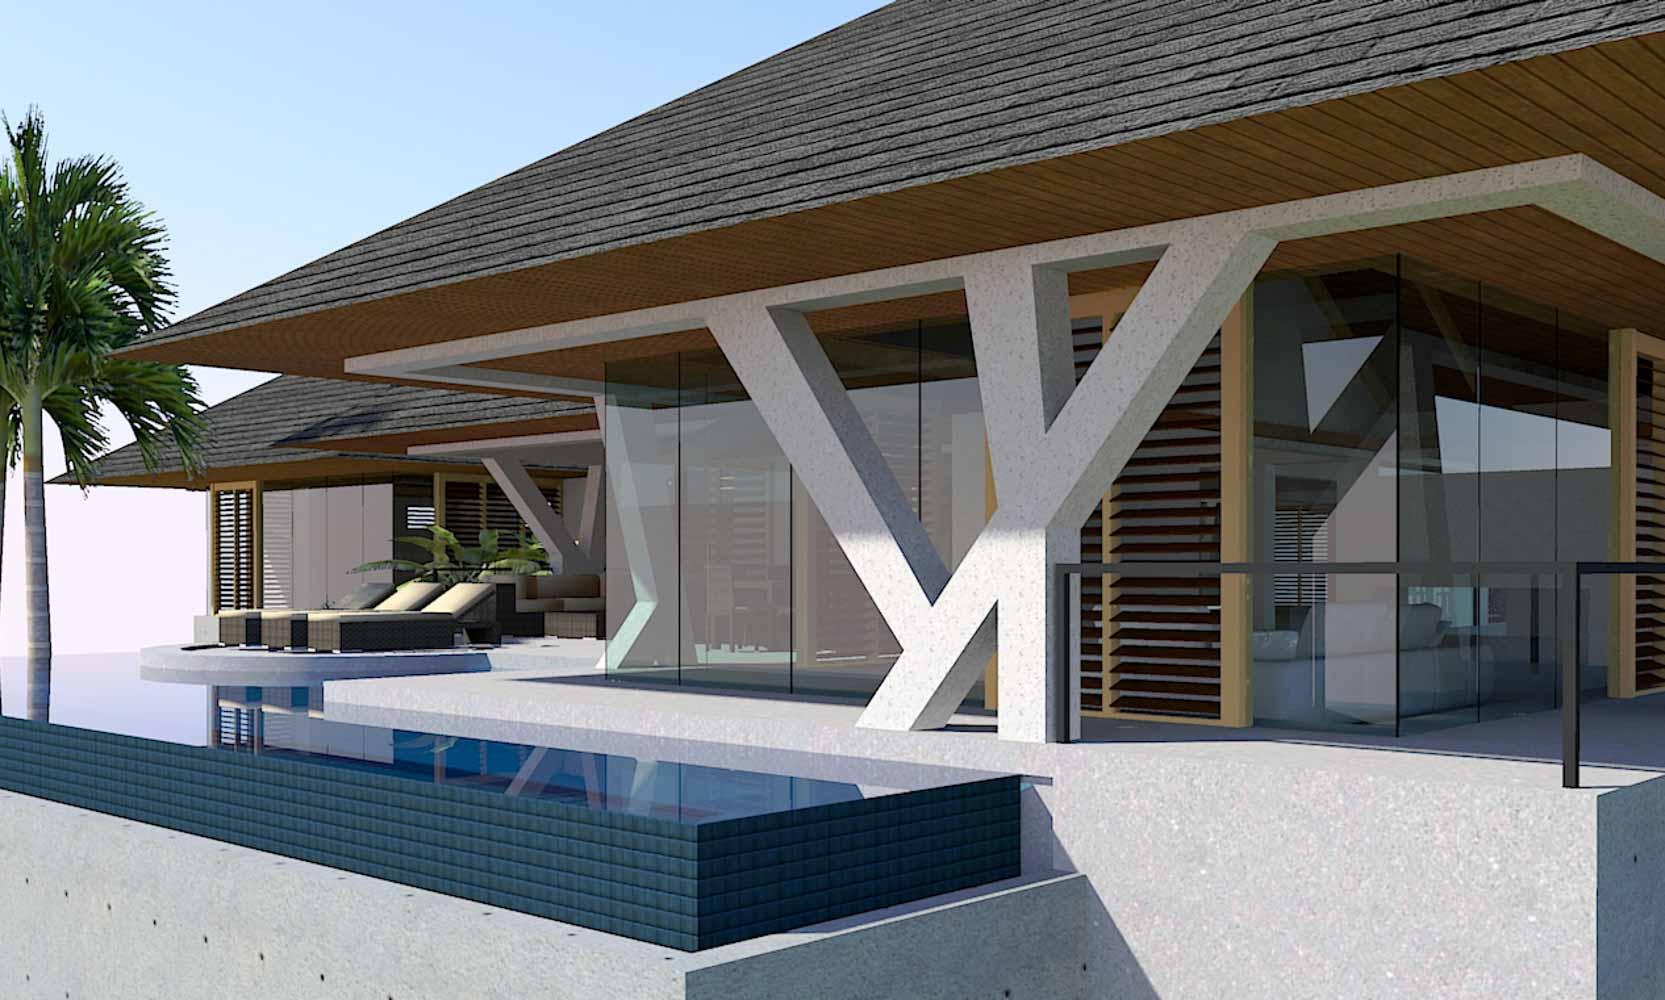 Modern Glass House Design in Kauai, Hawaii by Bjella Architects, Los Angeles